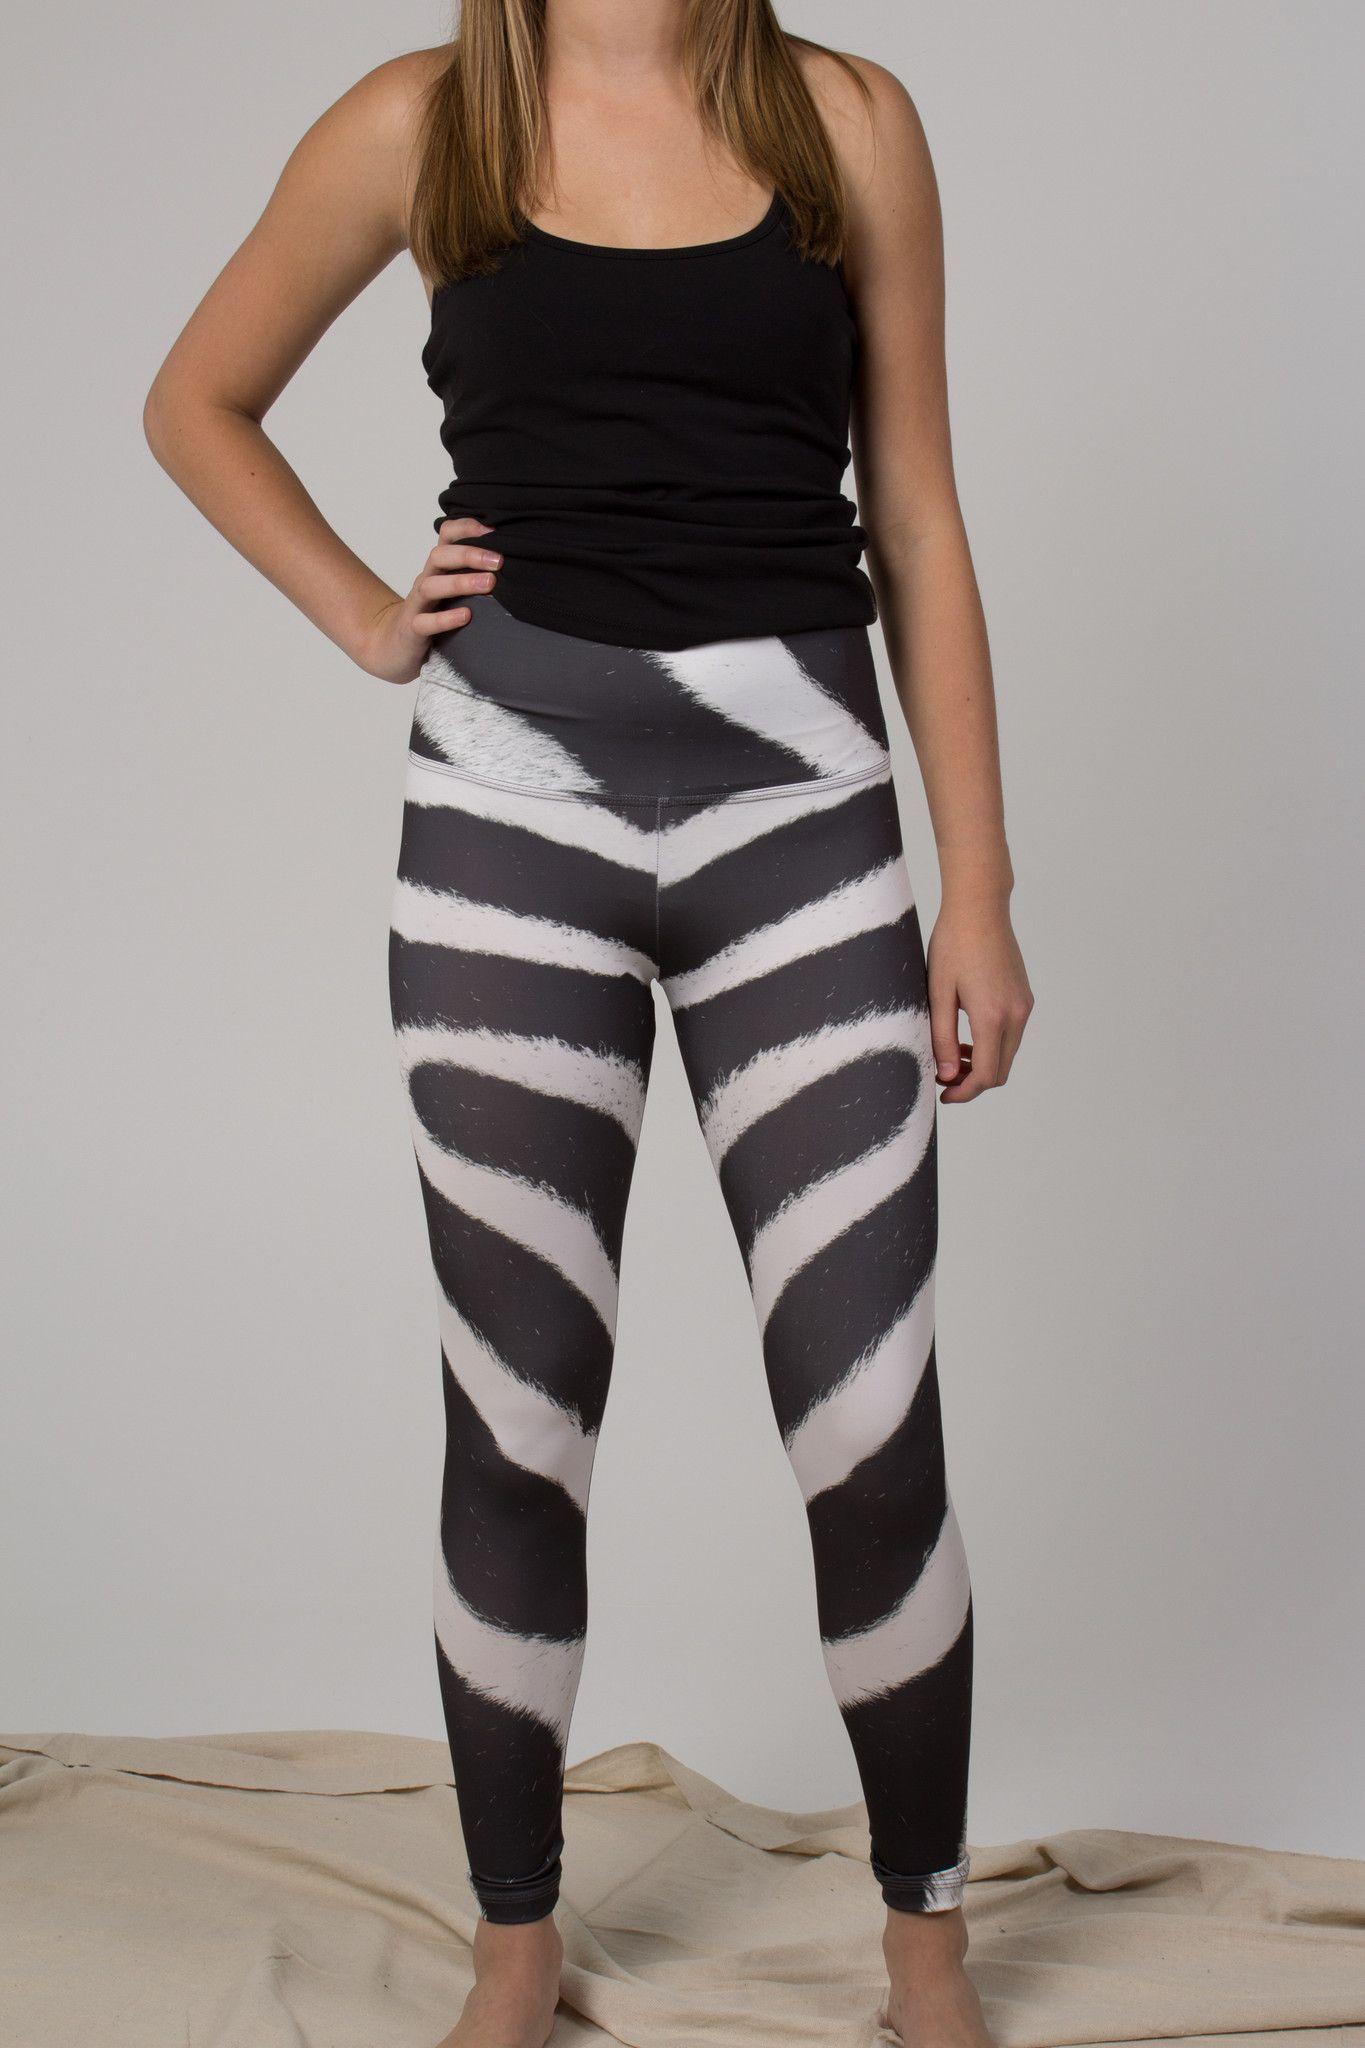 fdebaecbb4f11 Om Shanti Clothing Zebra Legging | Outfits | Zebra leggings, Om ...